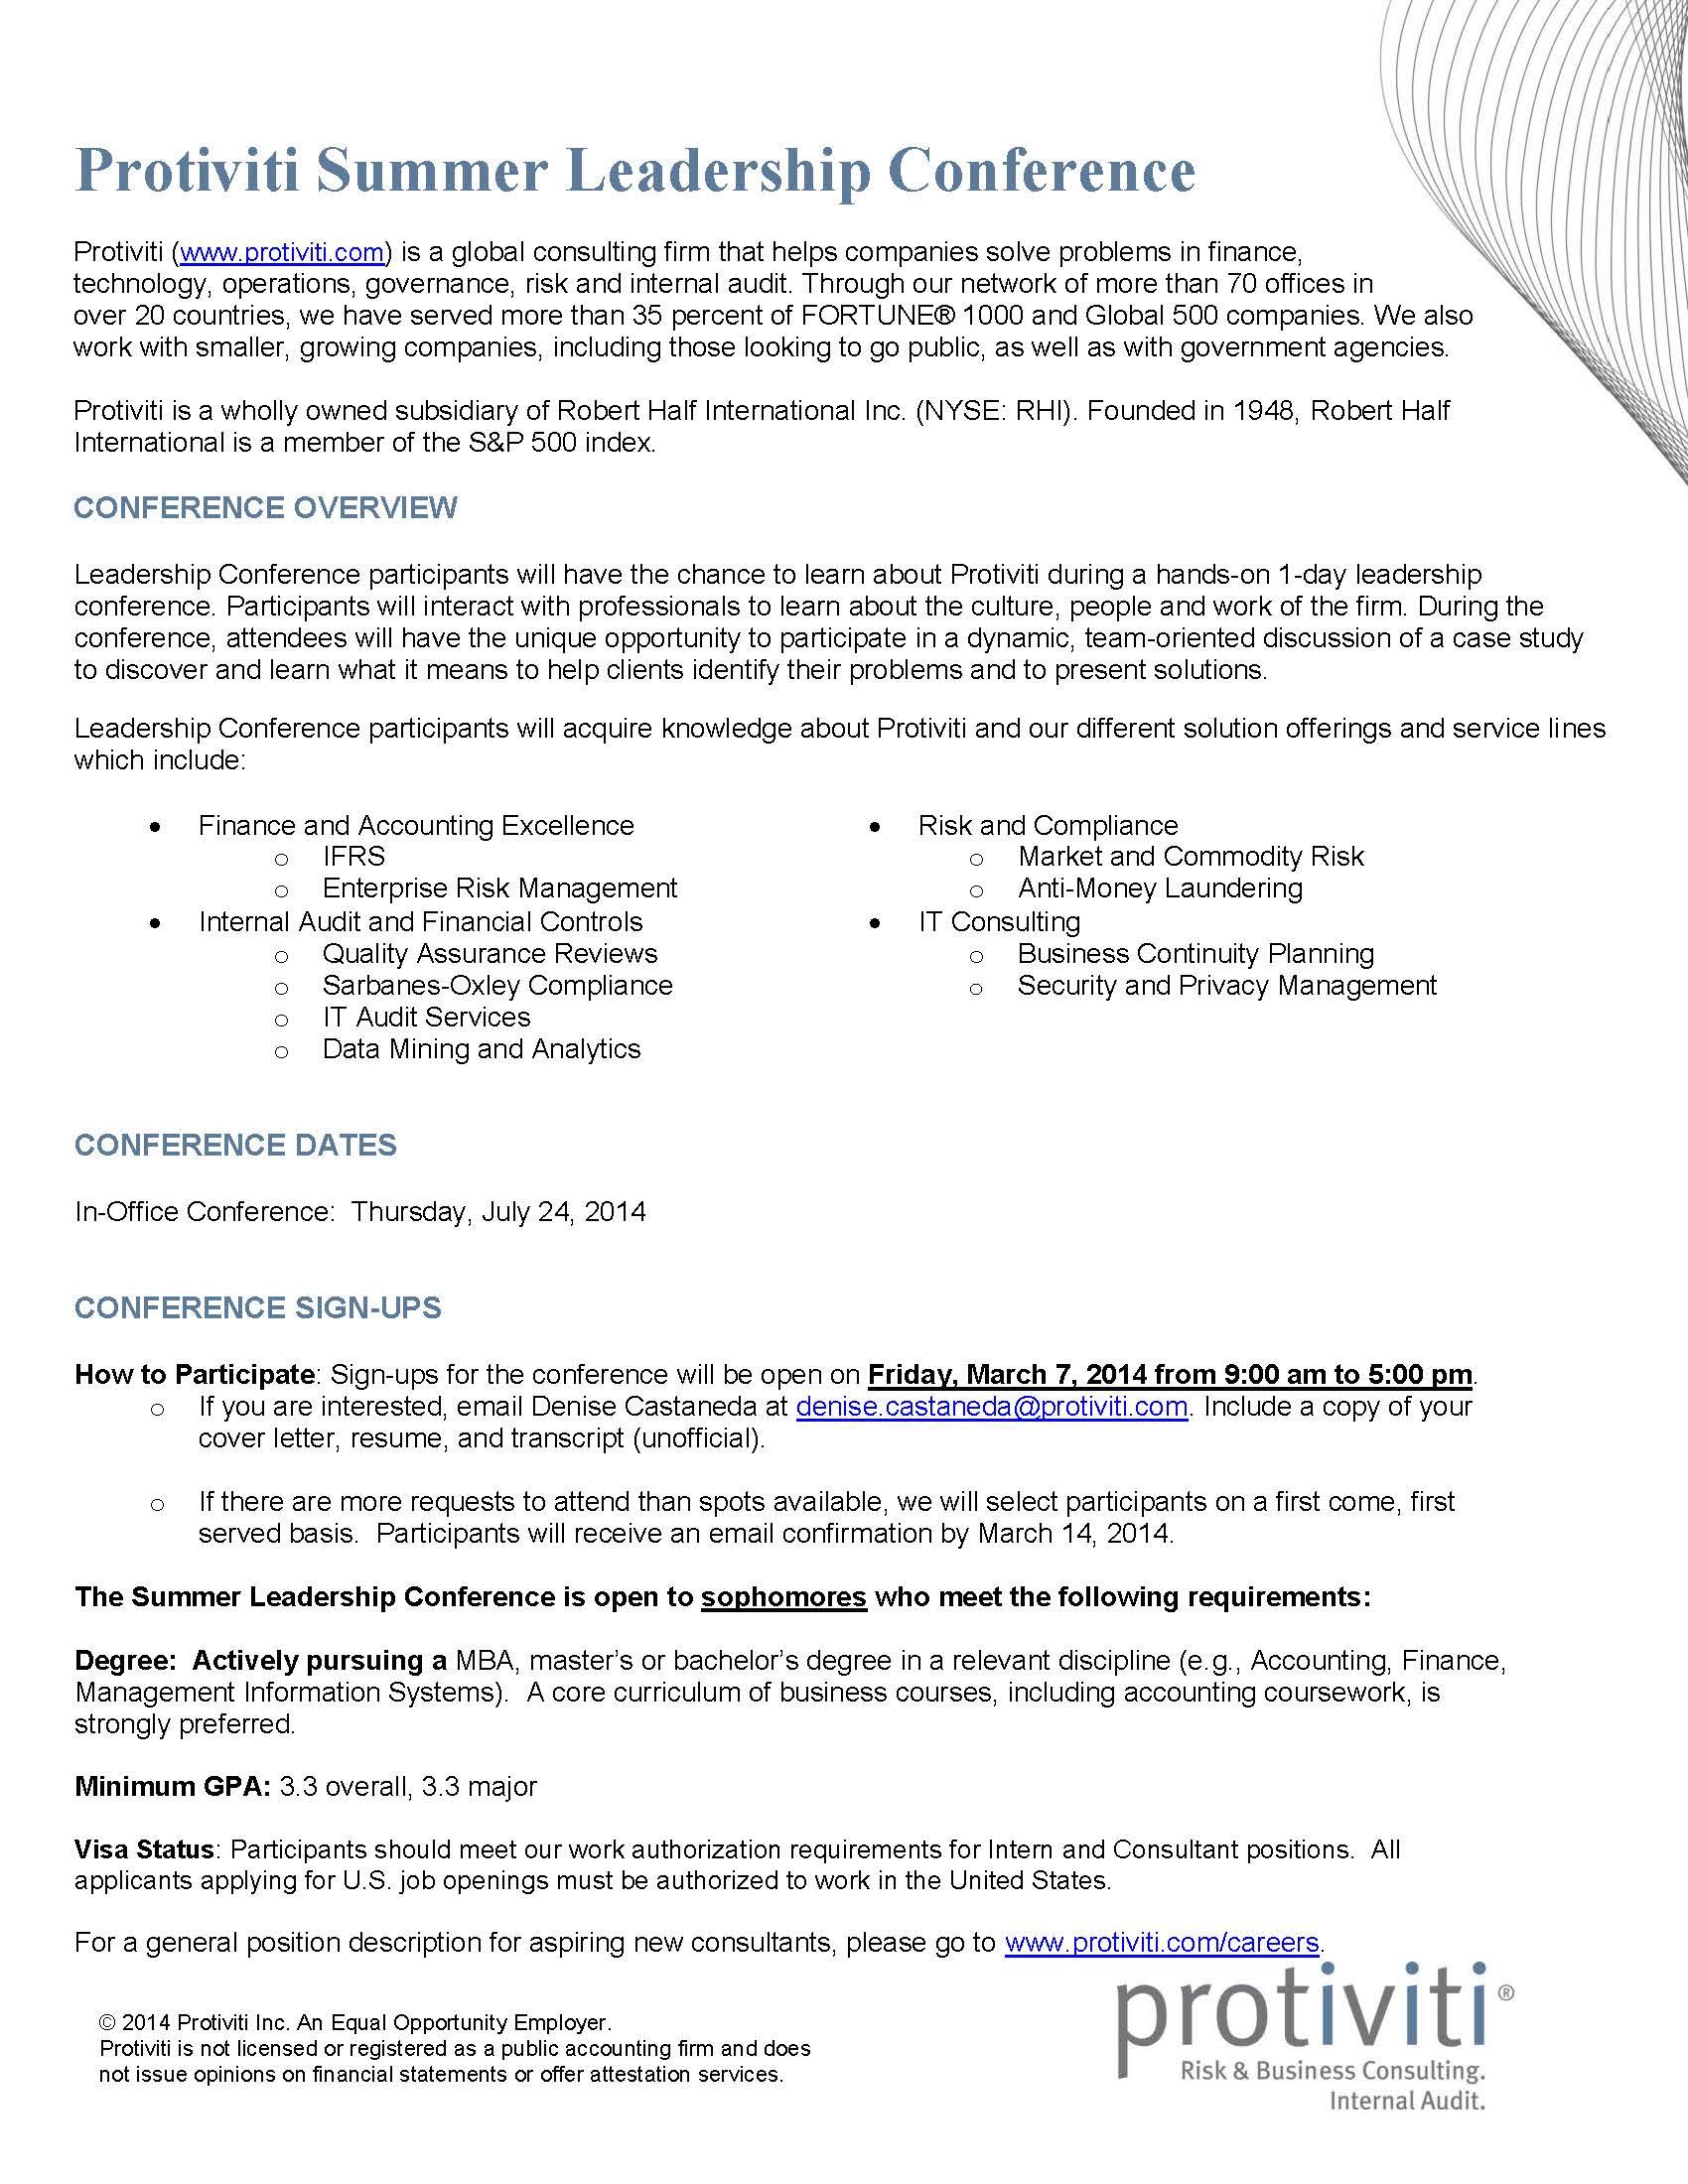 Ucsb Resume